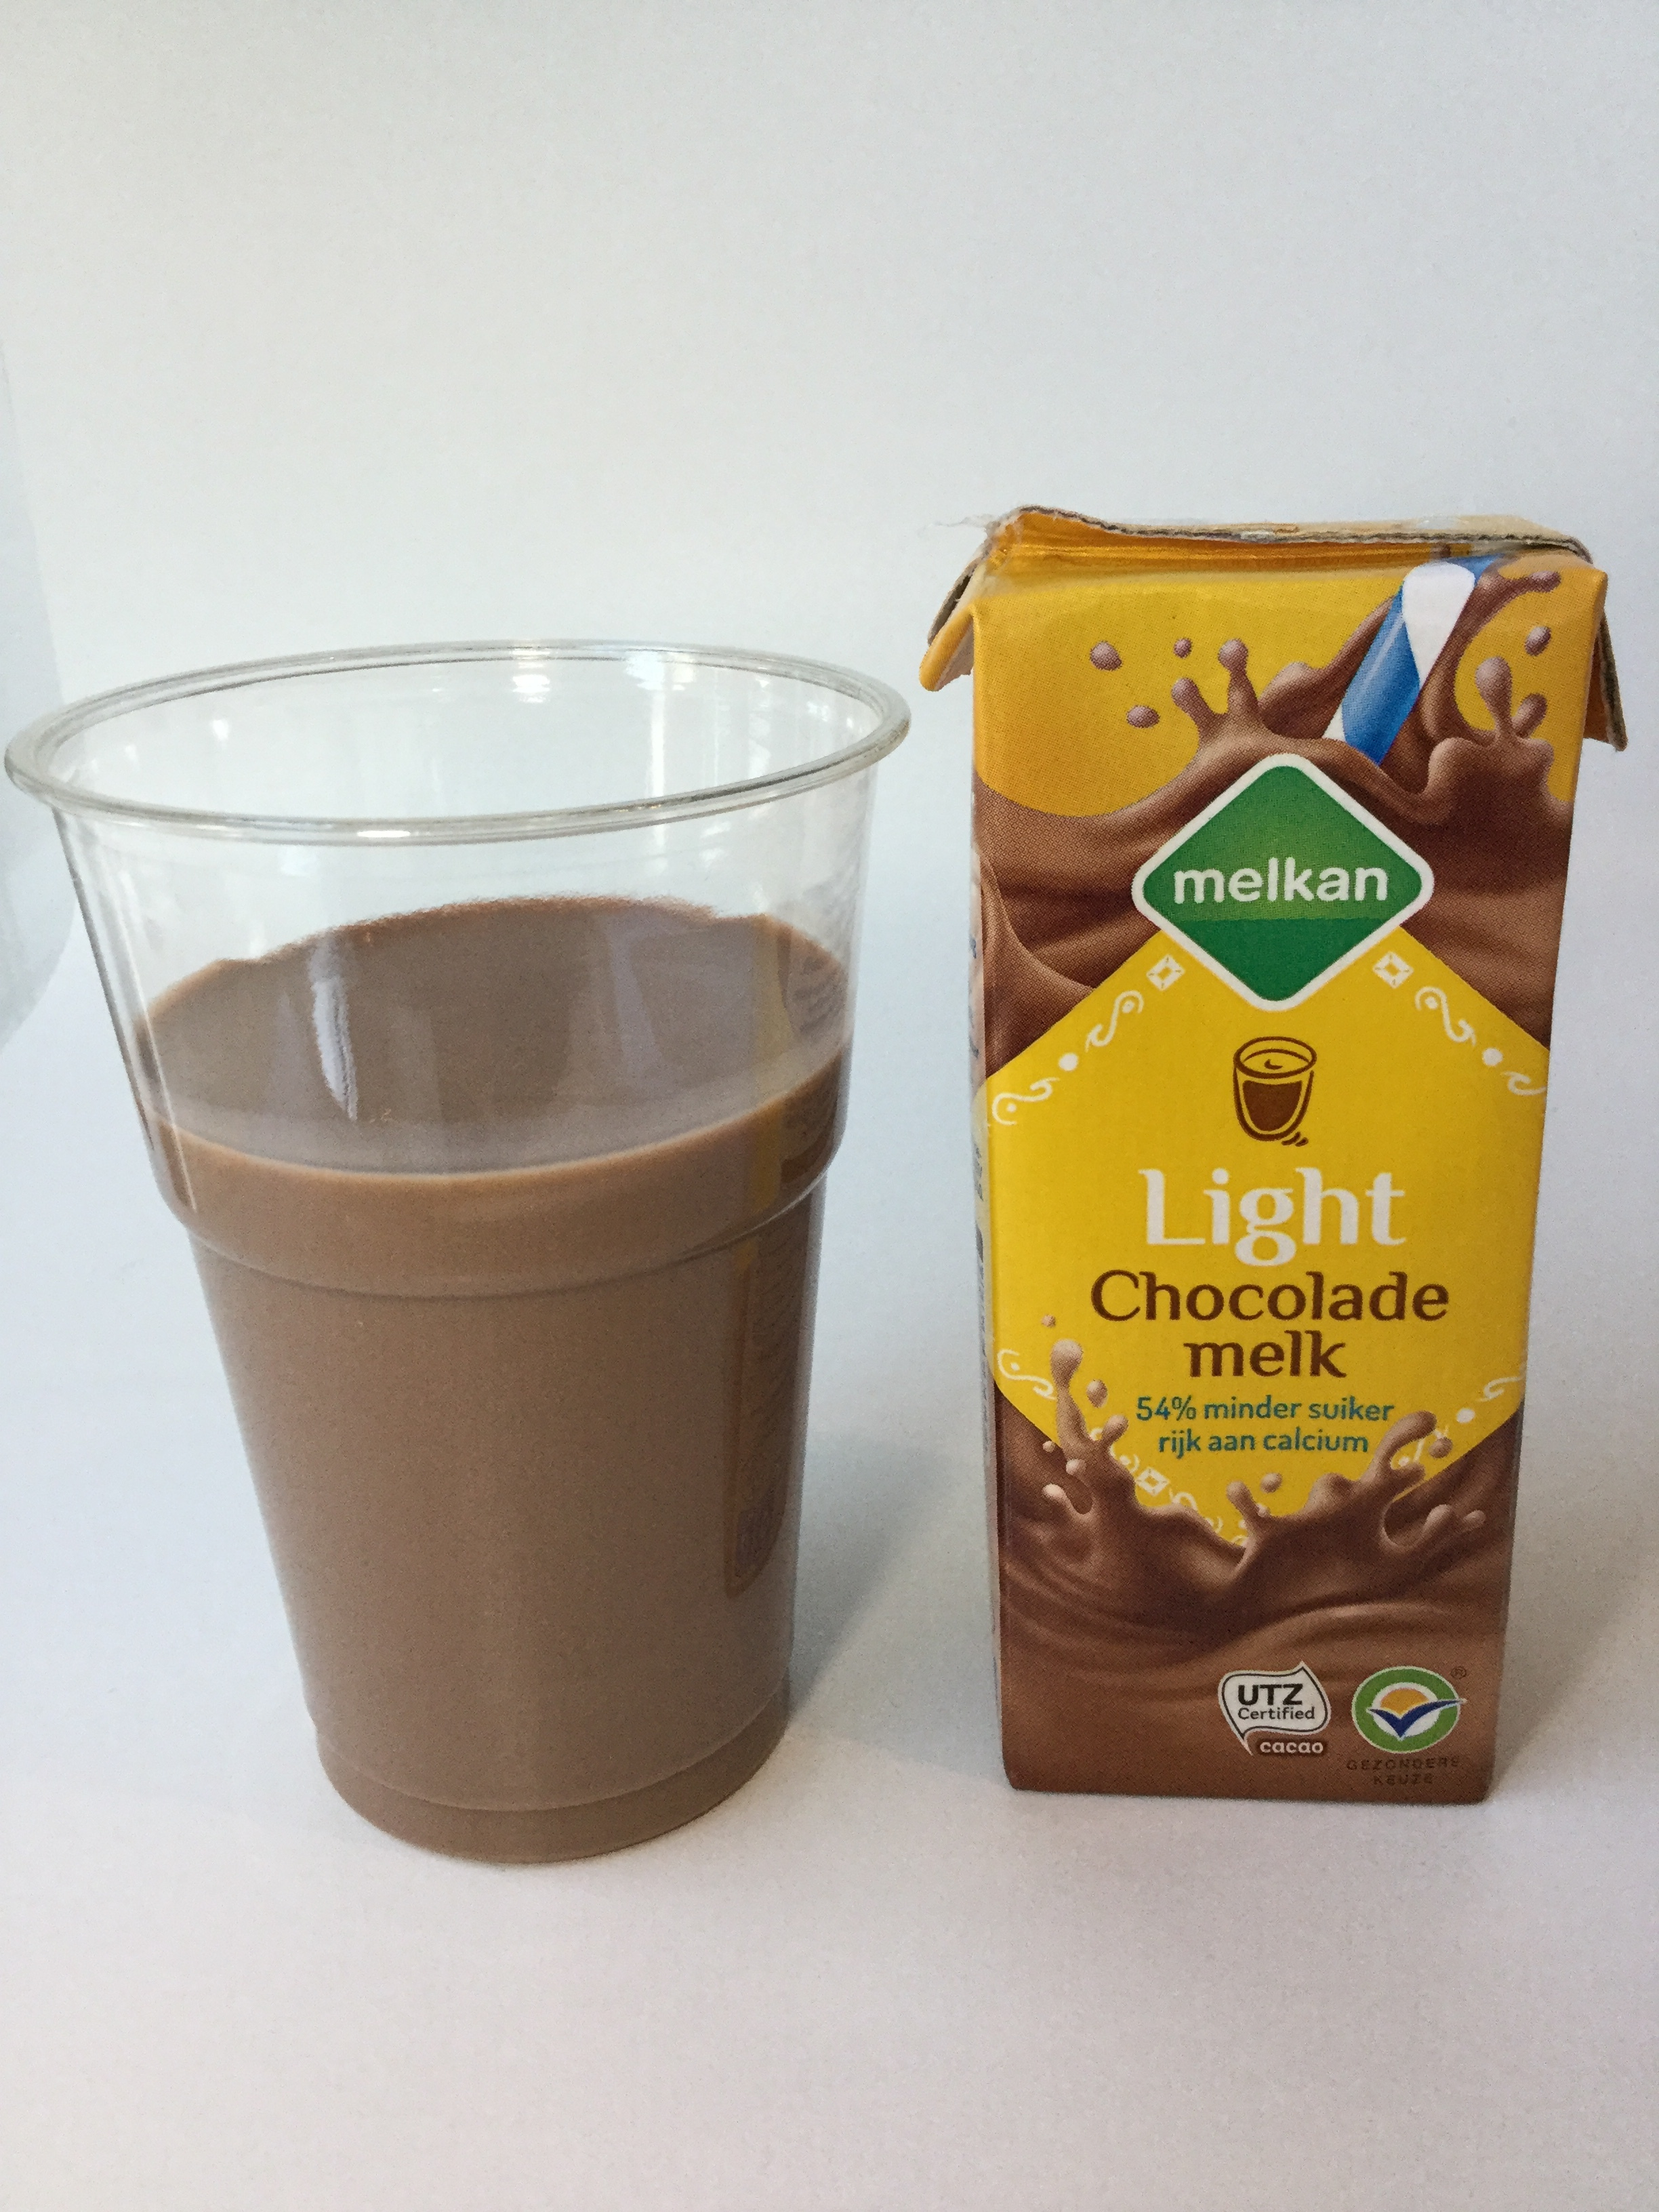 Melkan Light Chocolade Melk Cup